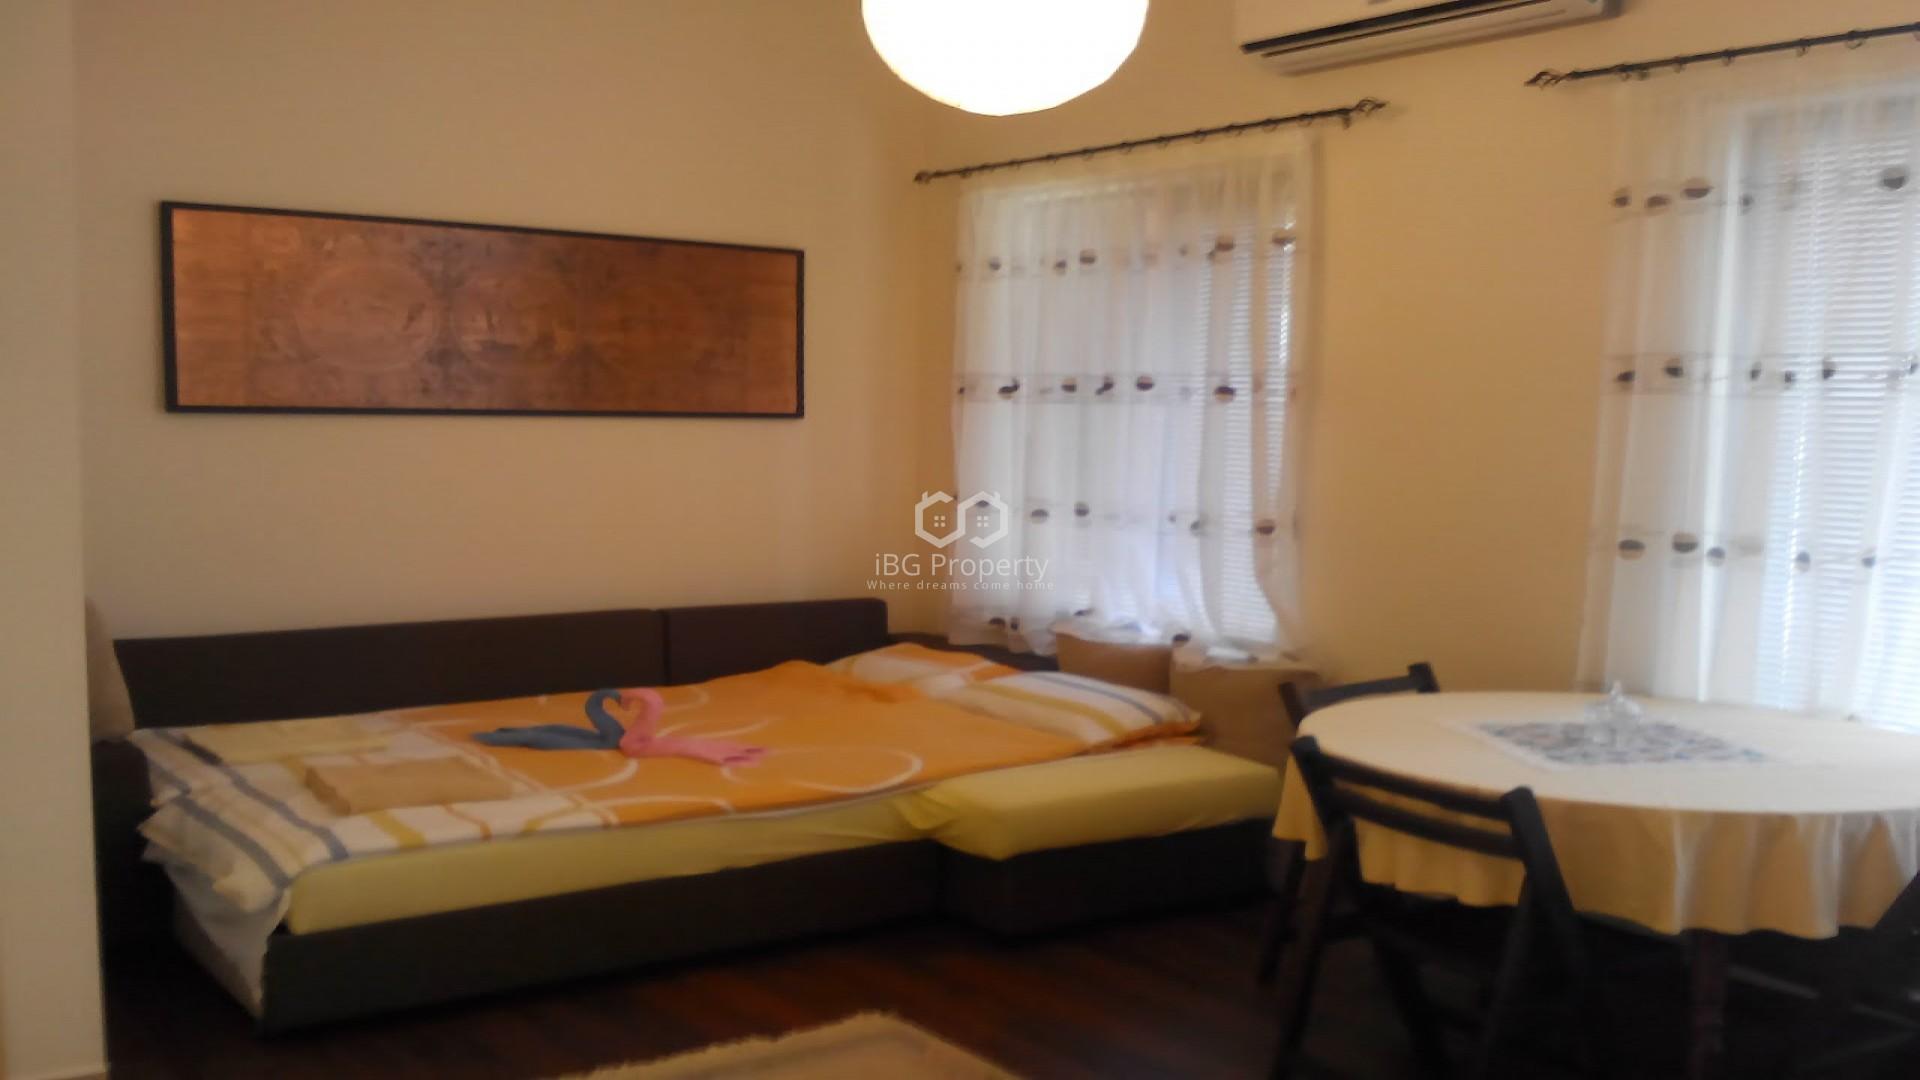 Однокомнатная квартира Бяла 42 m2